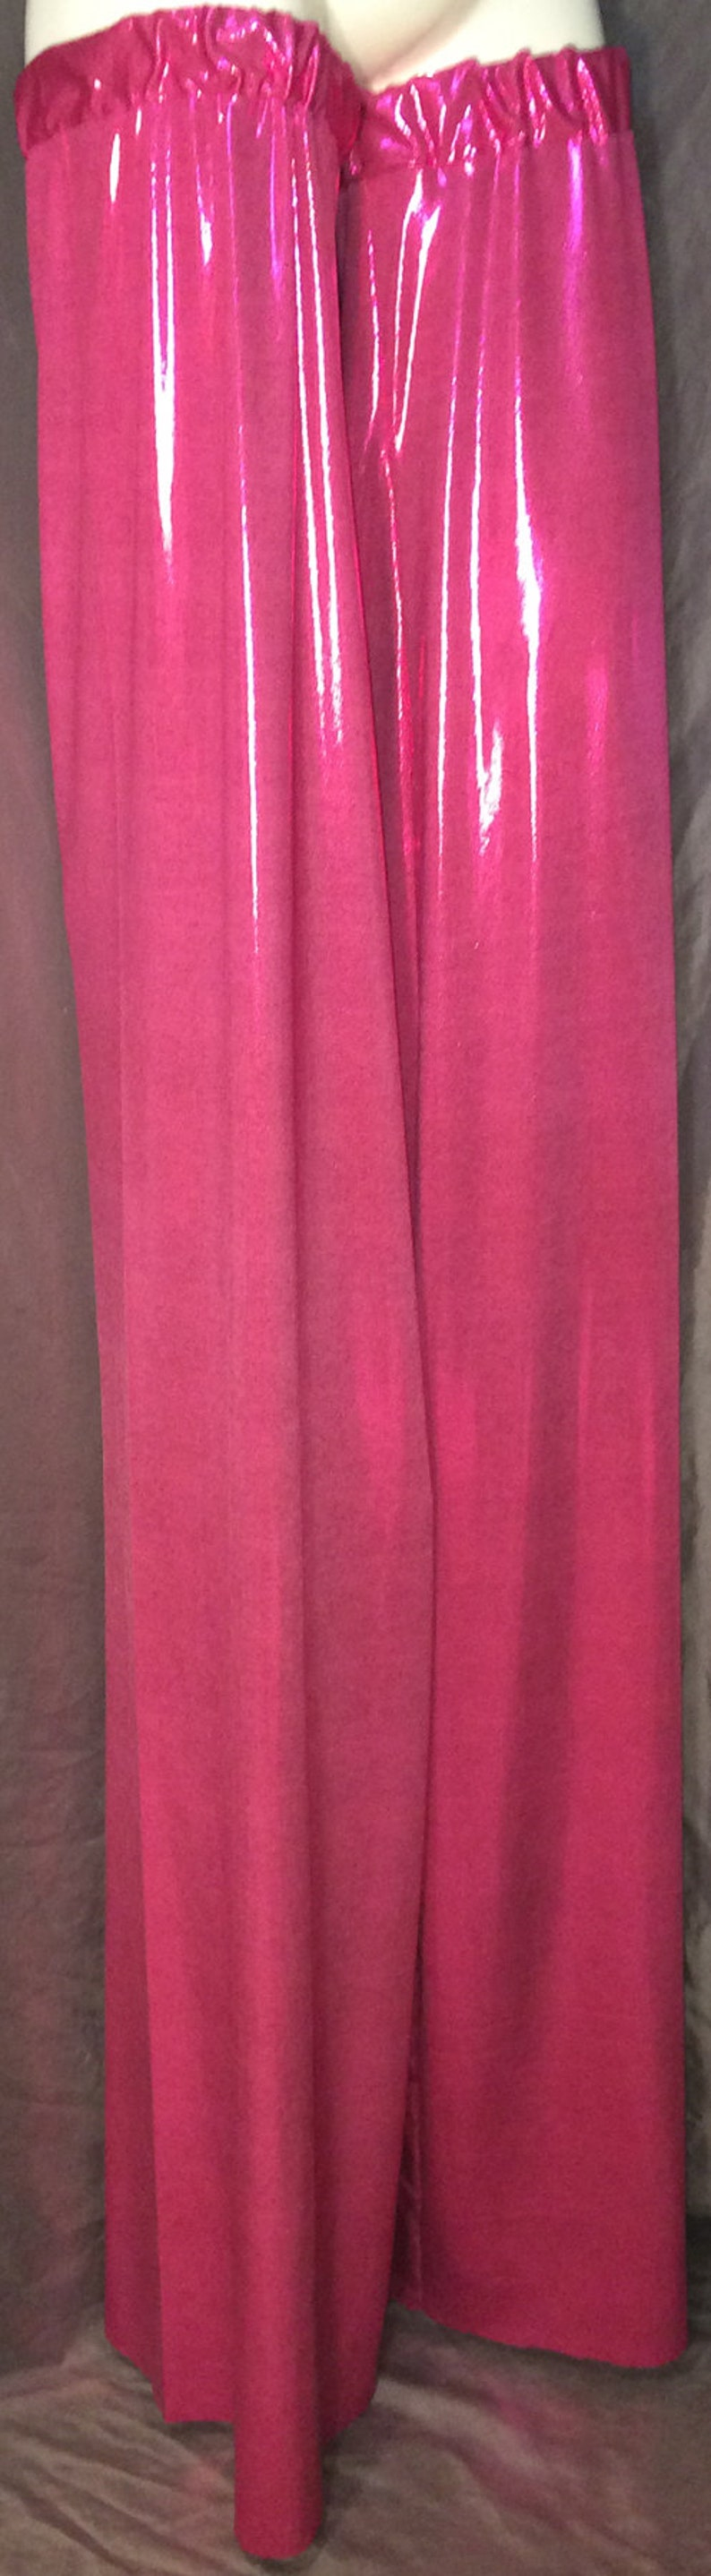 Stilt Covers for STILTS Pink 62